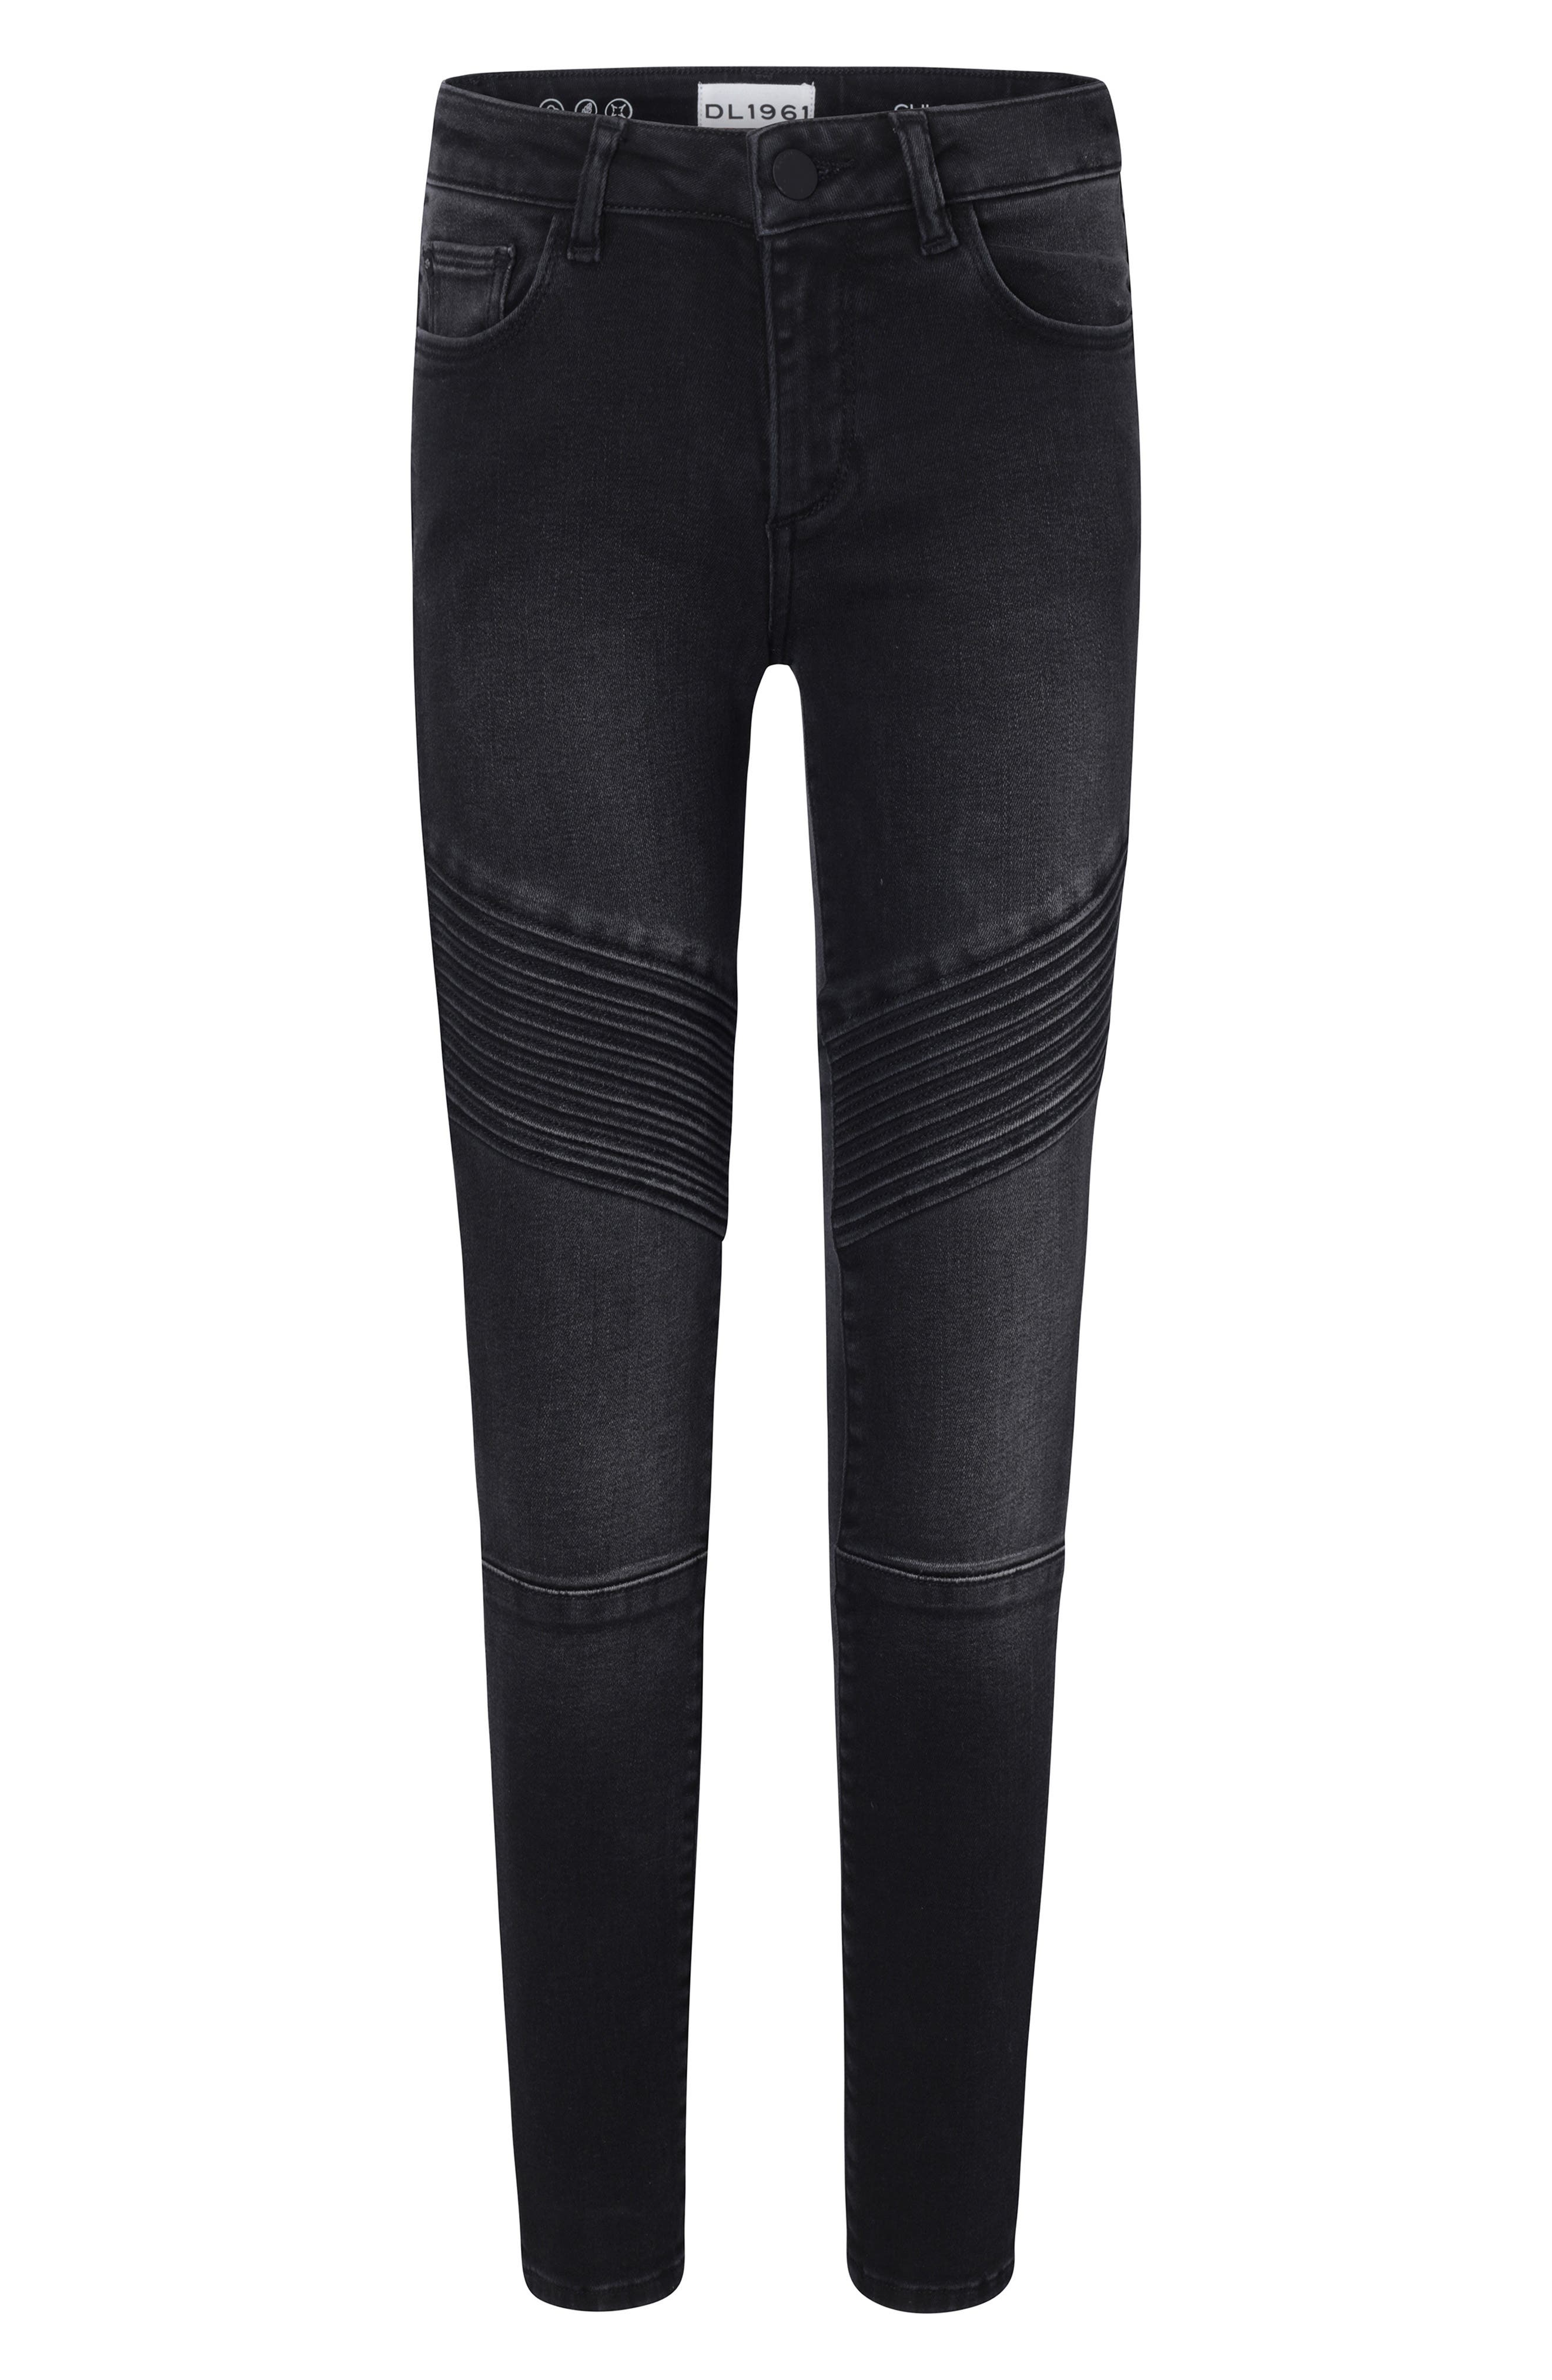 Chloe Moto Skinny Jeans,                             Main thumbnail 1, color,                             DUTCH